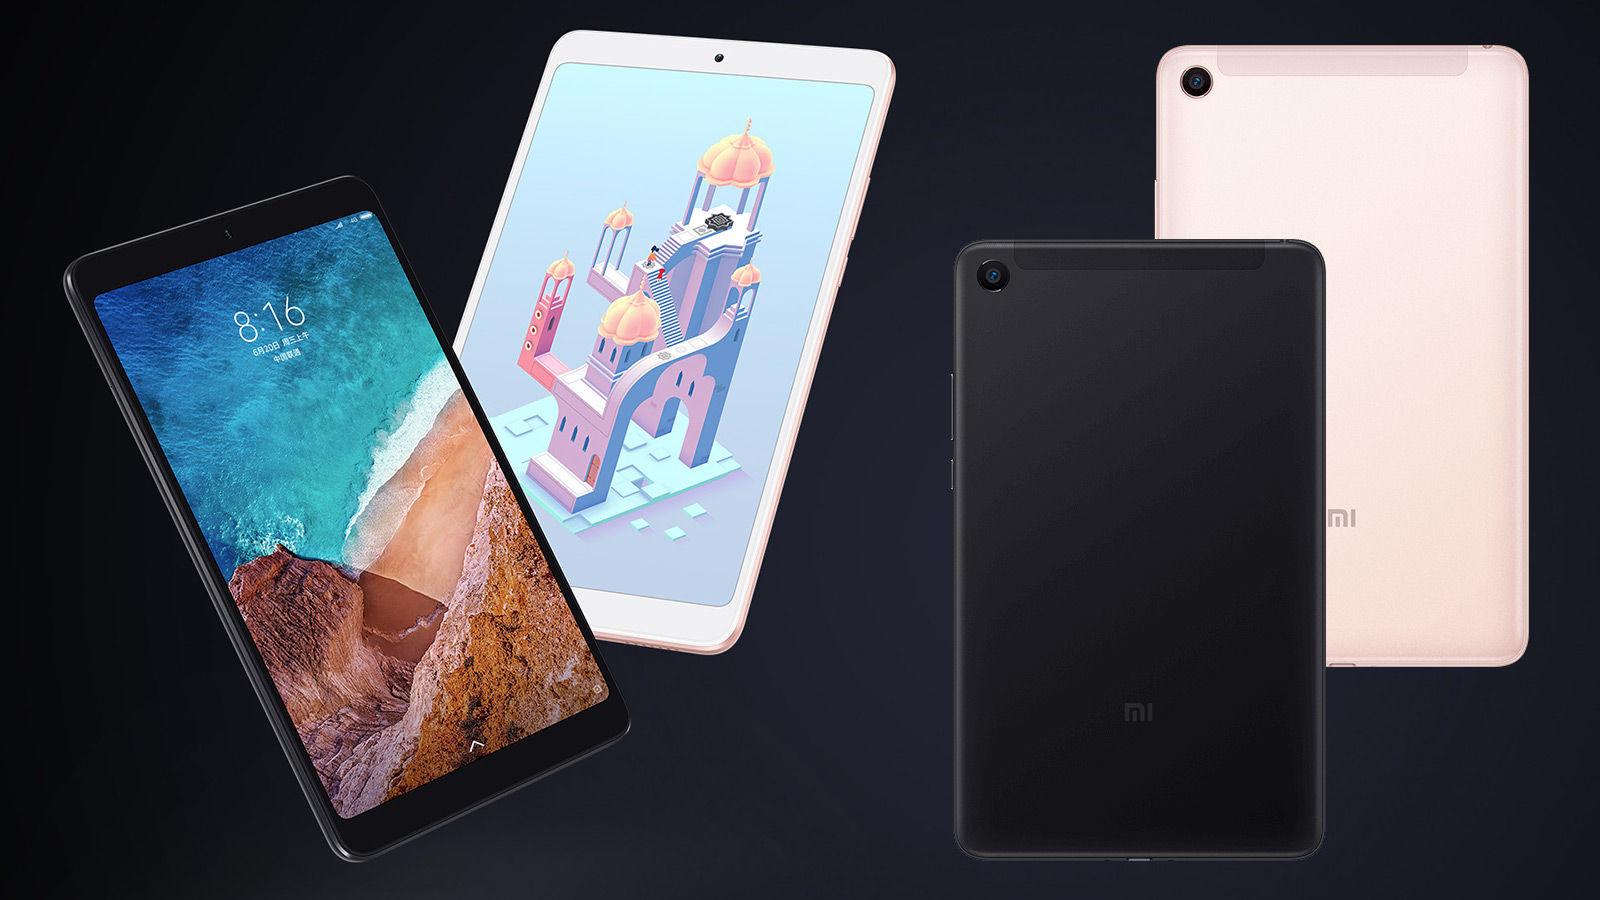 Xiaomi Pad 5 vs Pad 5 Pro 5G ,Xiaomi Pad 5 Camera Pad 5 Pro 5G,Xiaomi Pad 5 Camera Vs Pad 5 Pro 5G Camera,Xiaomi Pad 5 Vs Pad 5 Pro 5G Speed,Xiaomi Pad 5 Camera, Pad 5 Pro 5G Cama